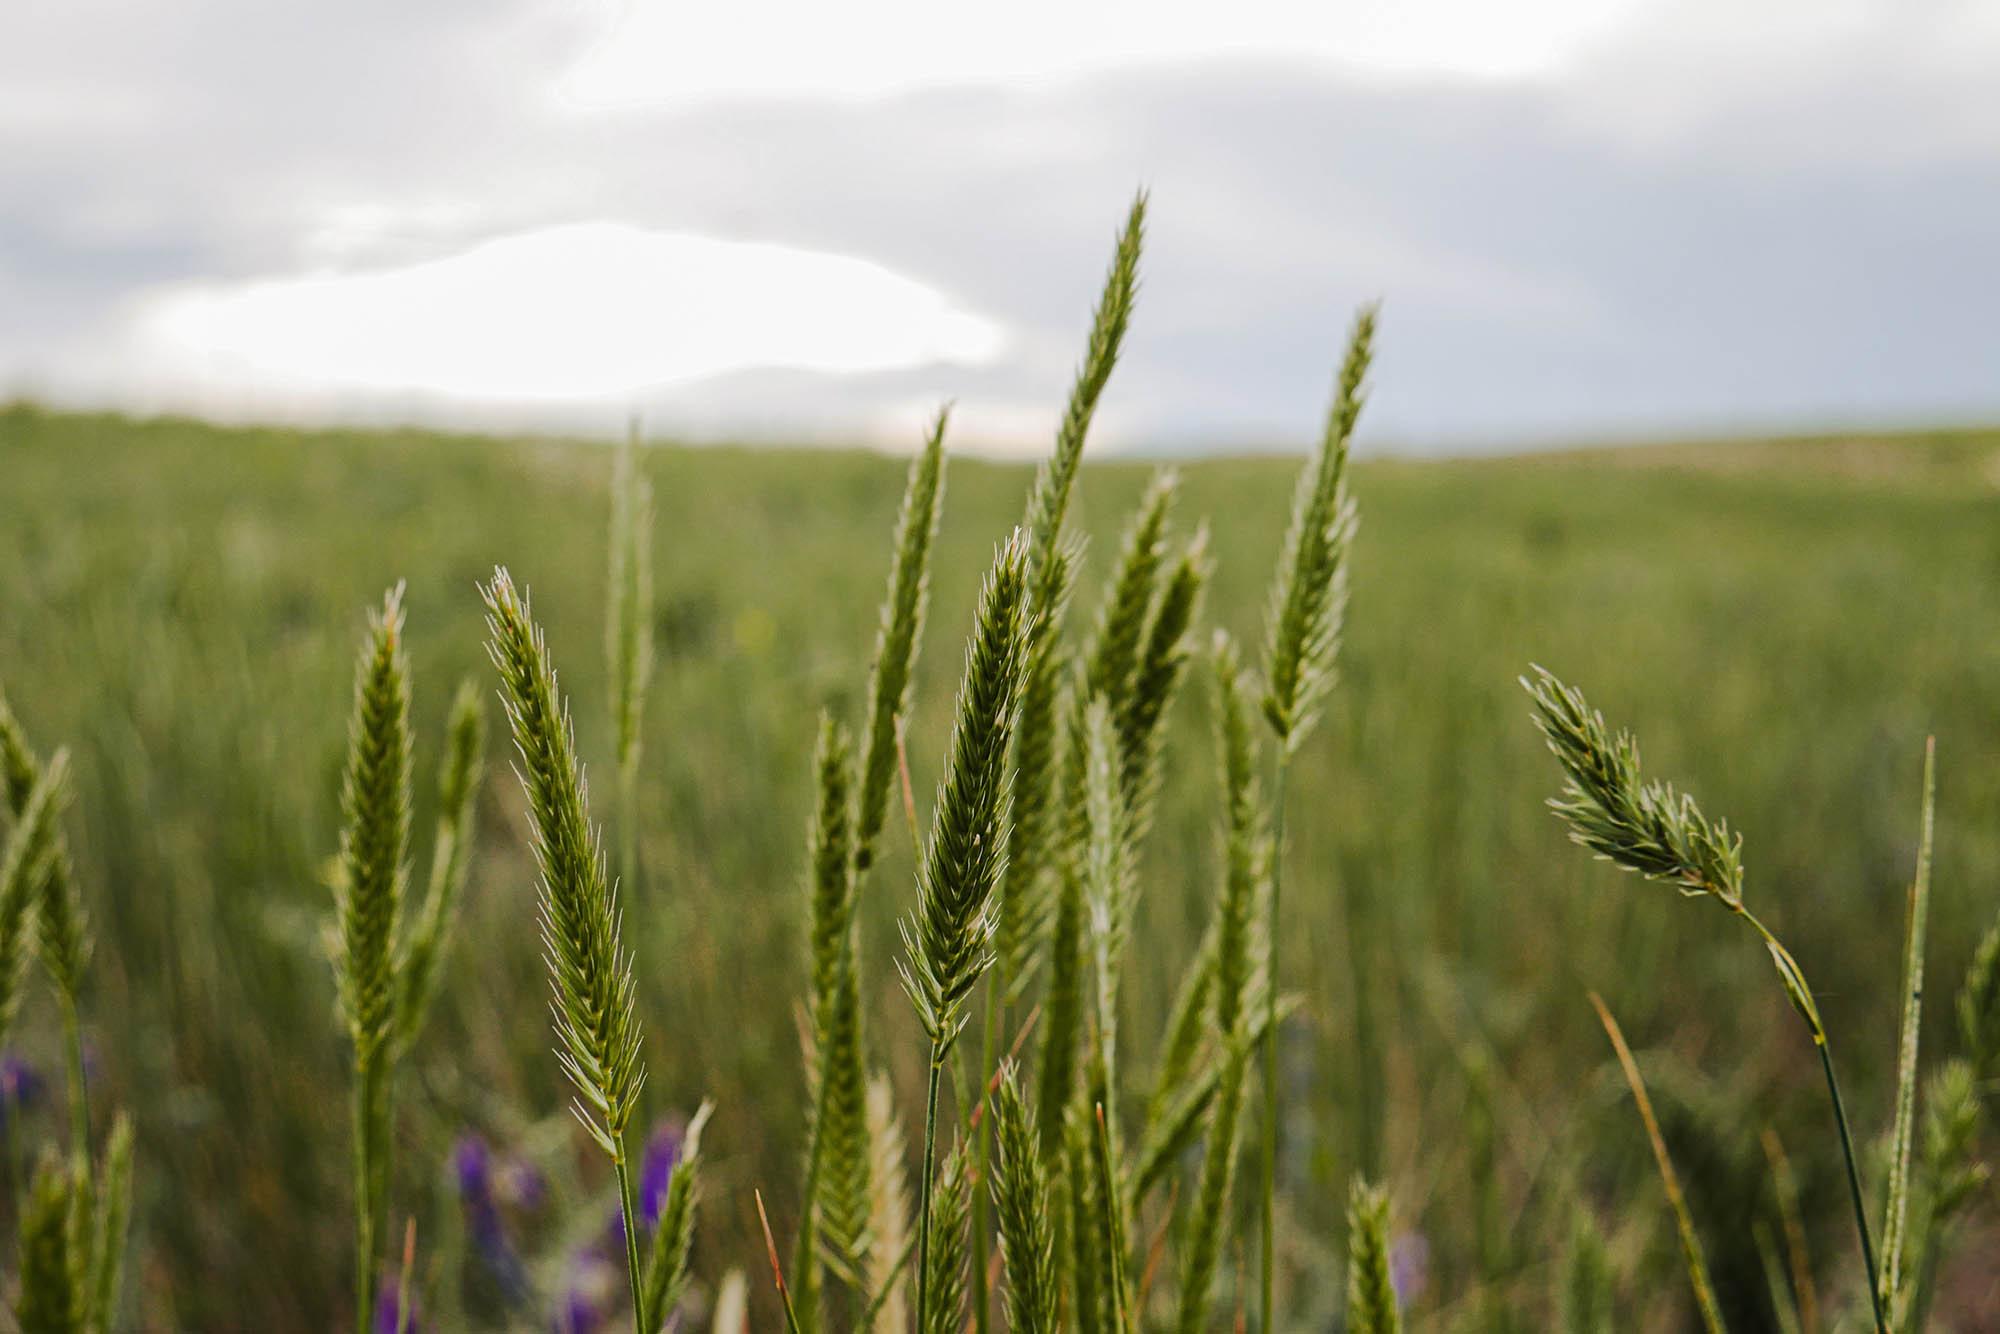 image of wheat by Matthew Bornhorst | Unsplash